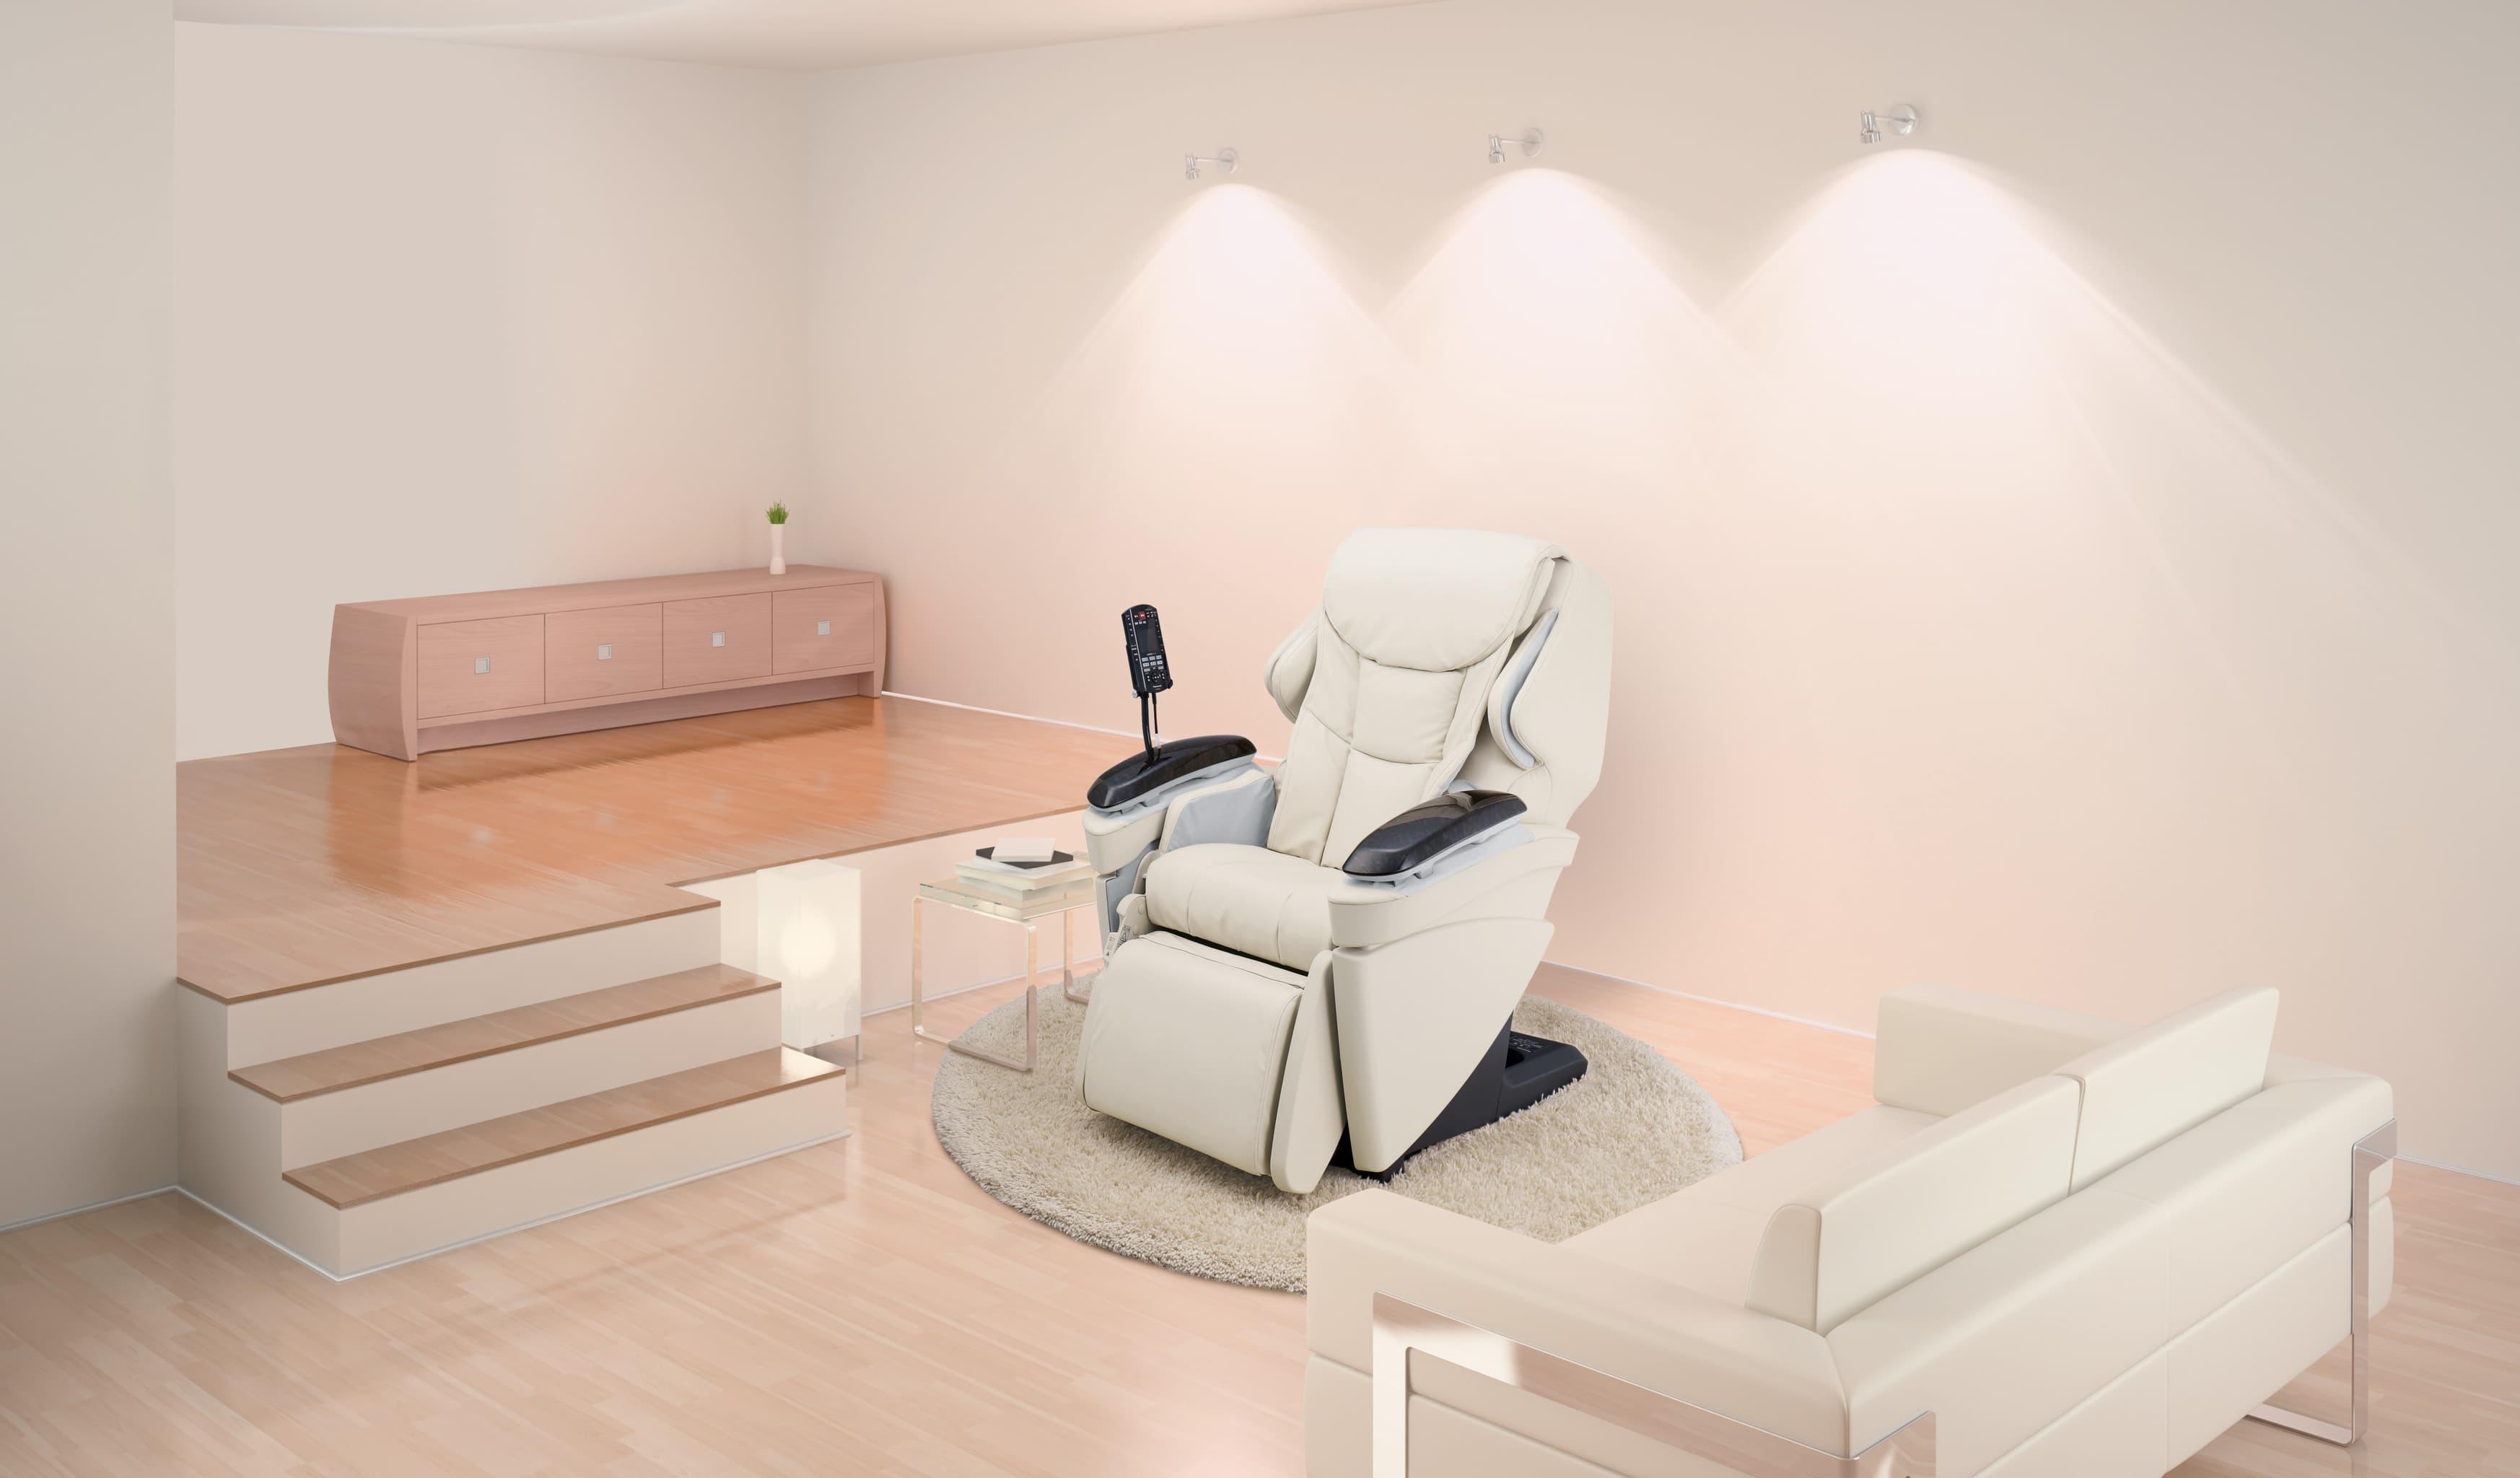 Panasonic_EP-MA70CX_interior1